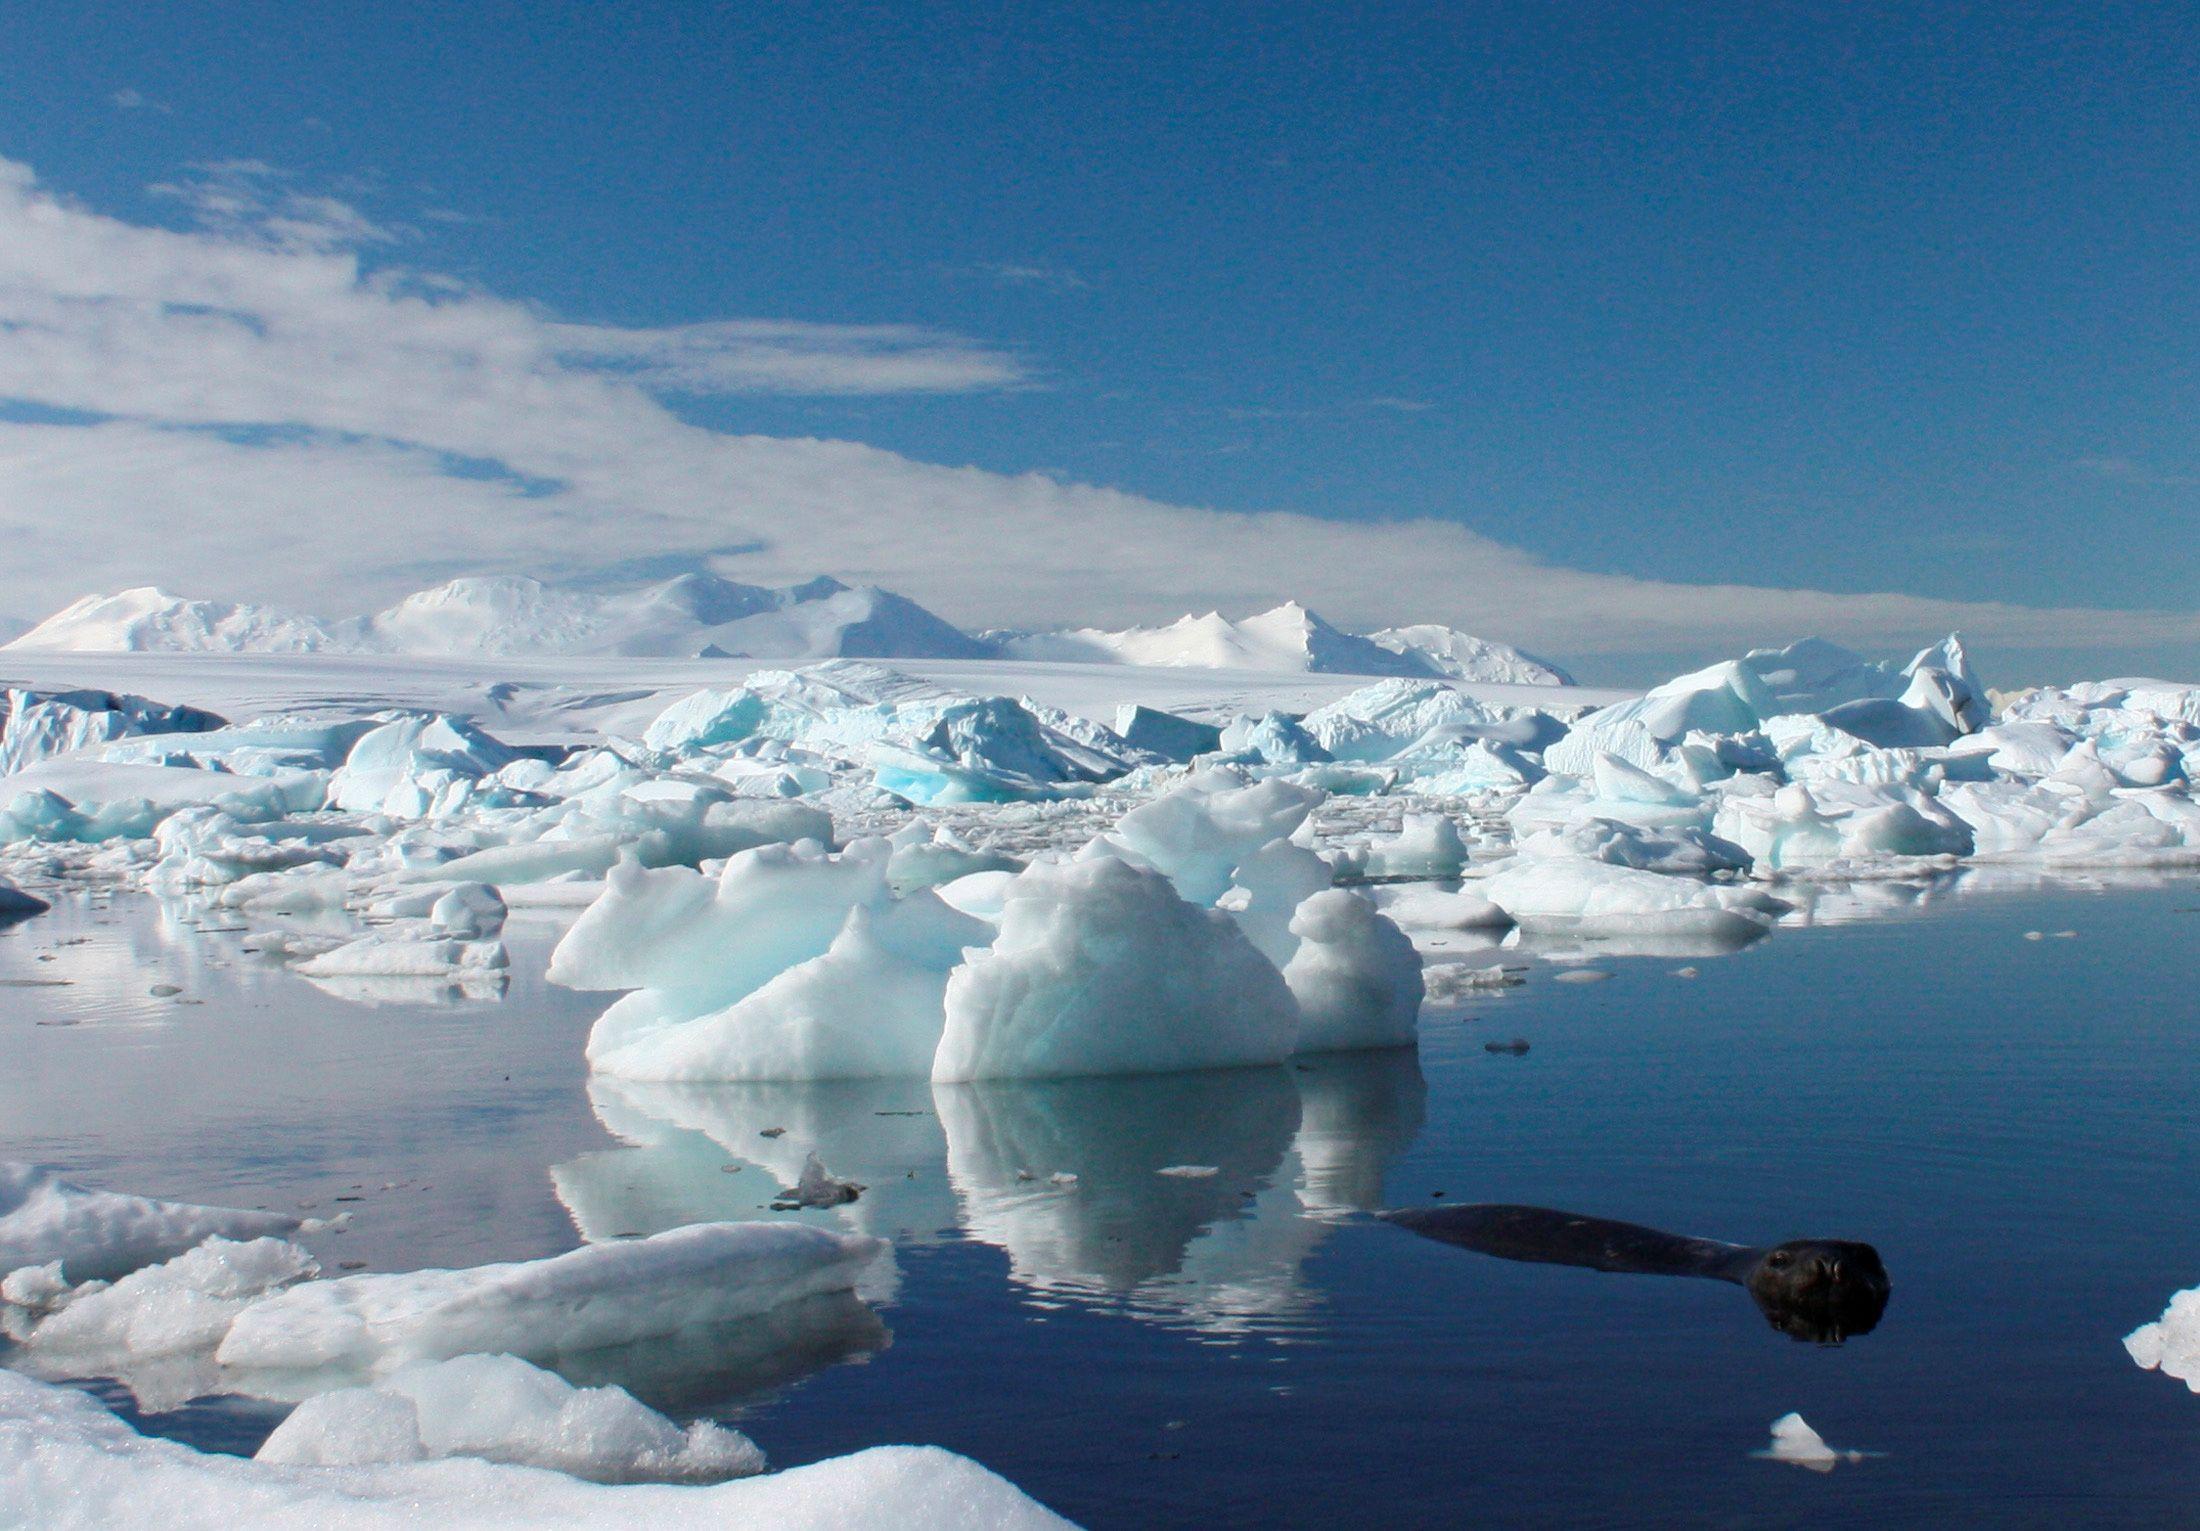 icebergs in the Antarctic